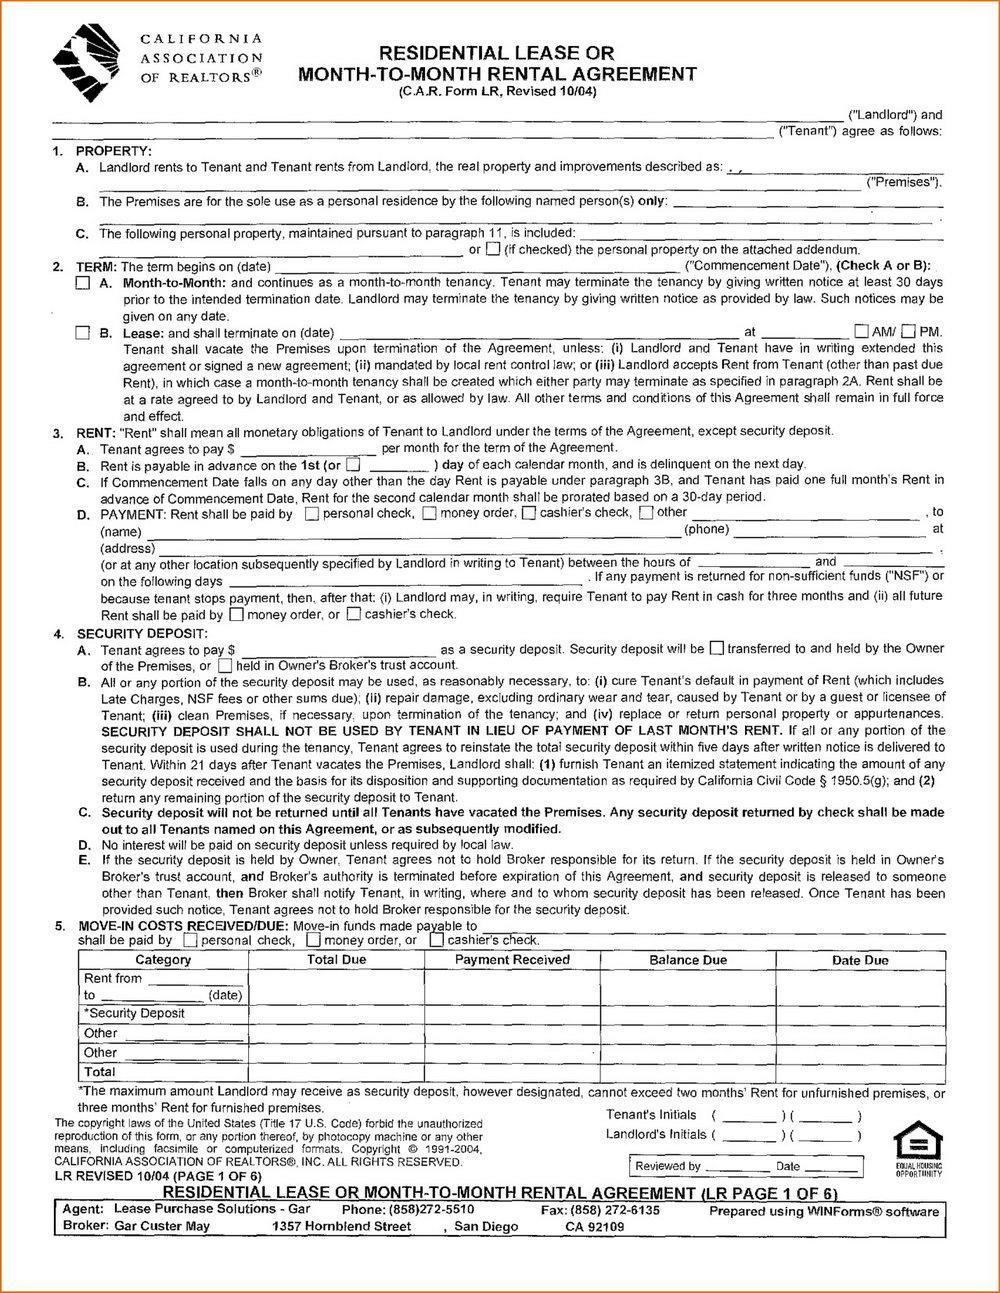 Rental Application Form California Association Of Realtors